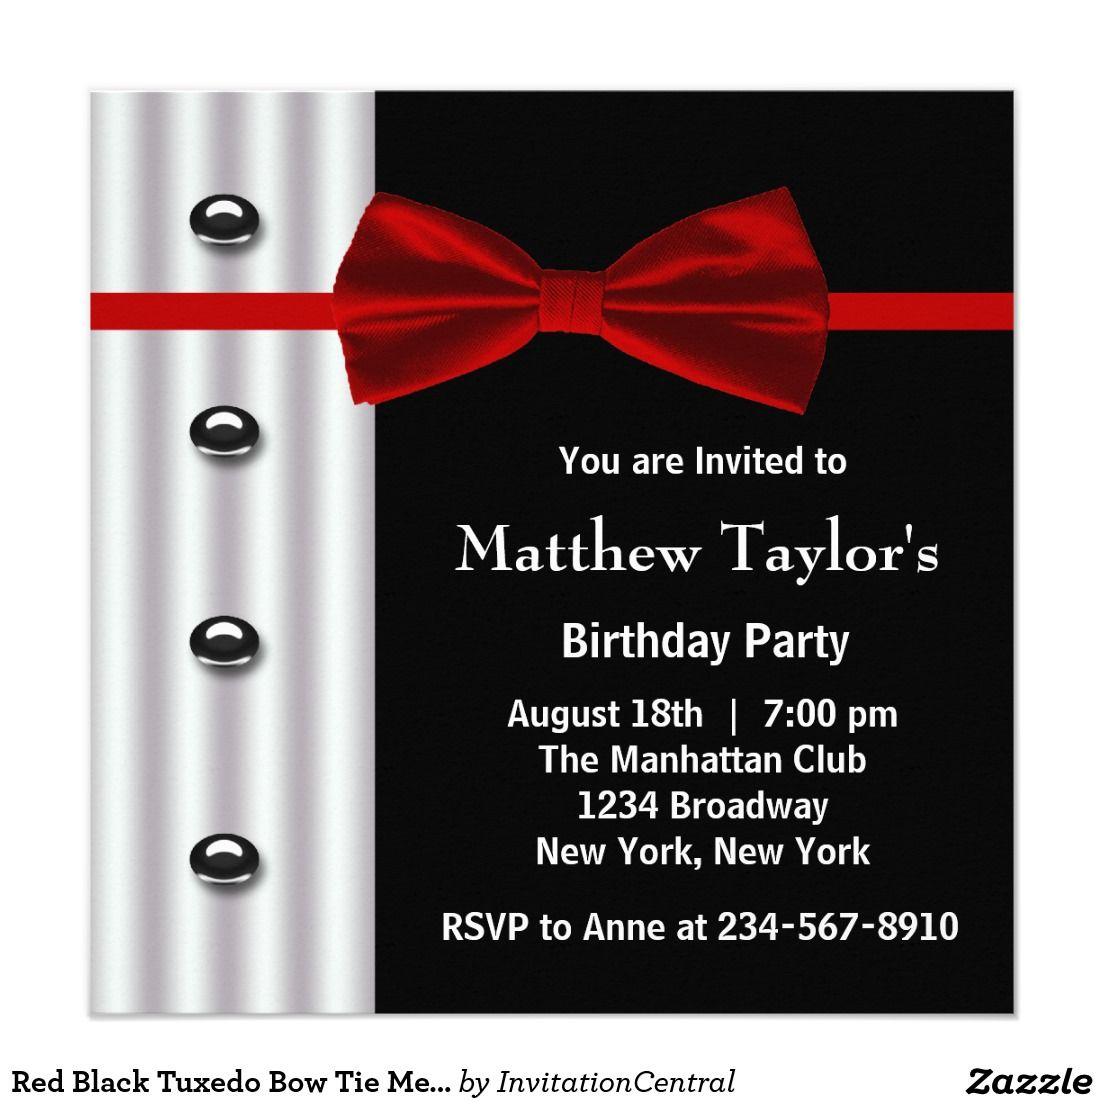 Red Black Tuxedo Bow Tie Mens Birthday Party Invitation | Pinterest ...